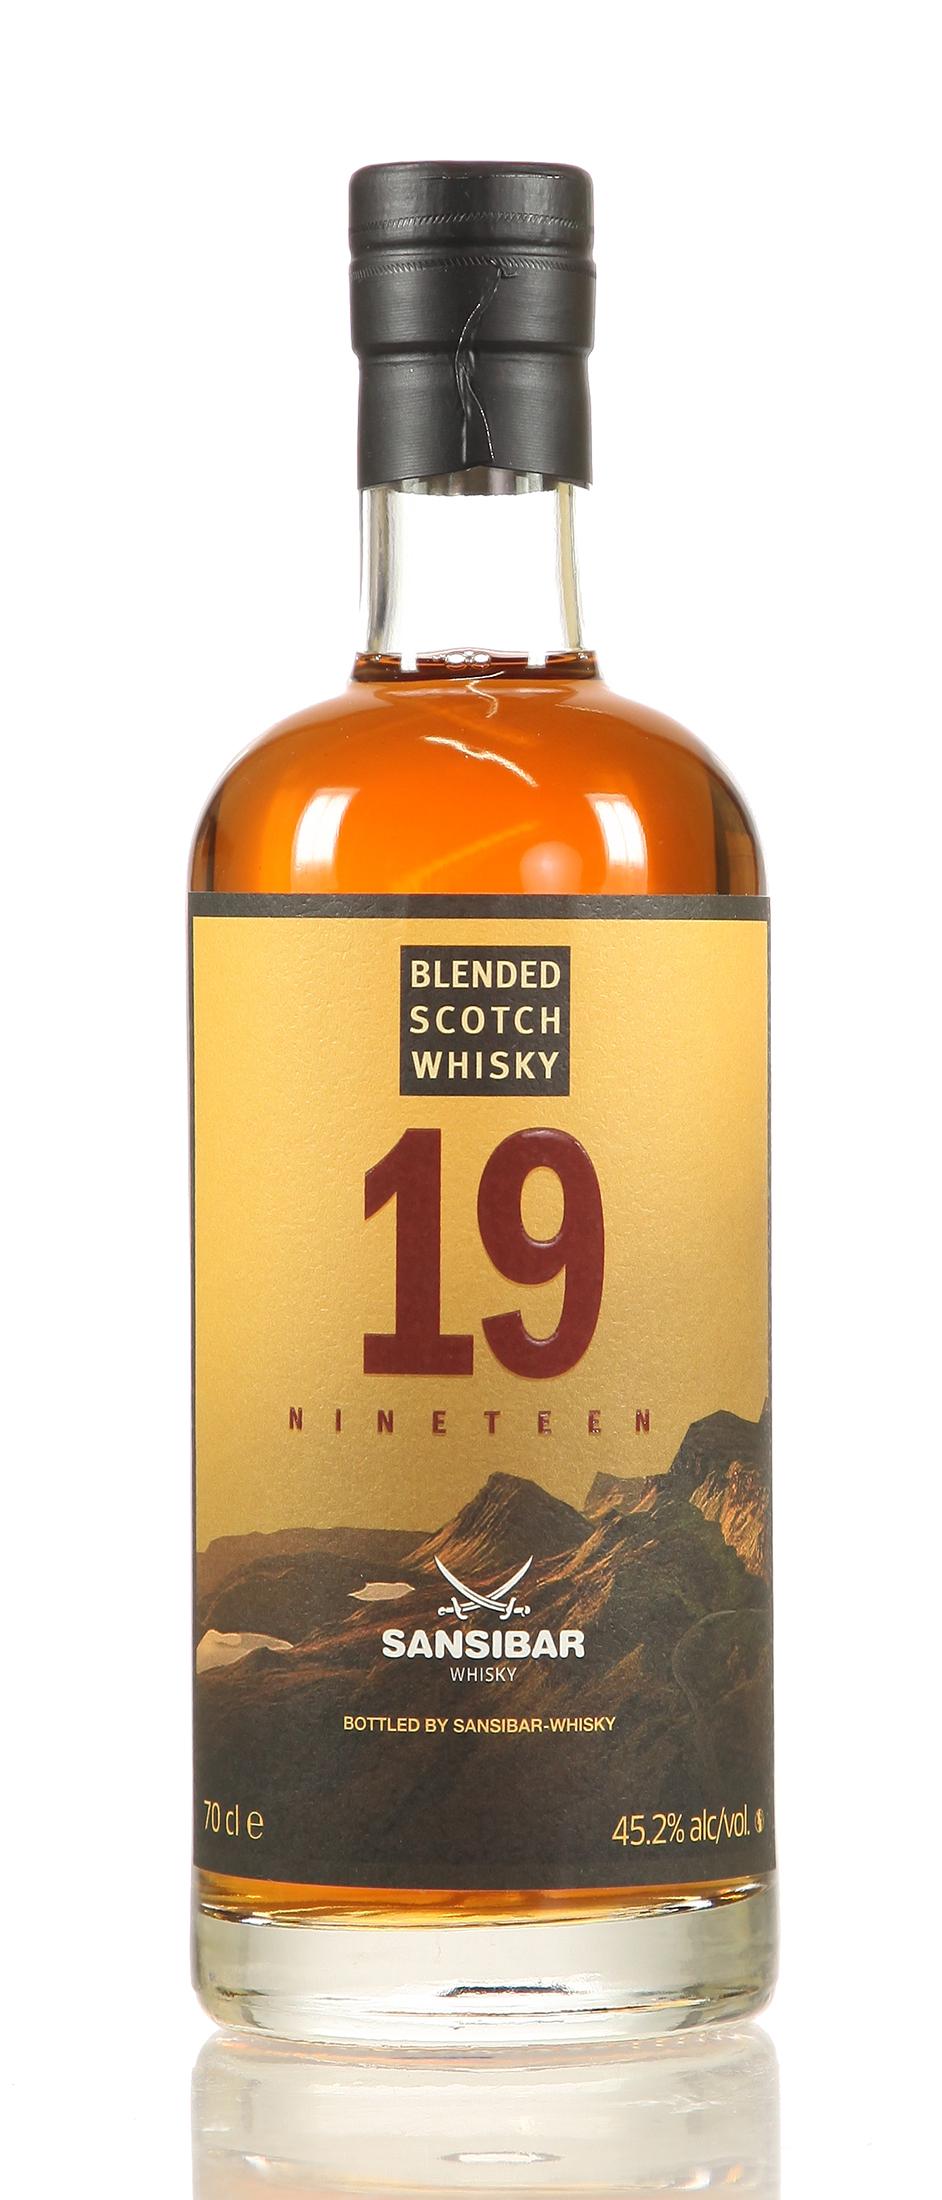 Blended Scotch Whisky Sansibar